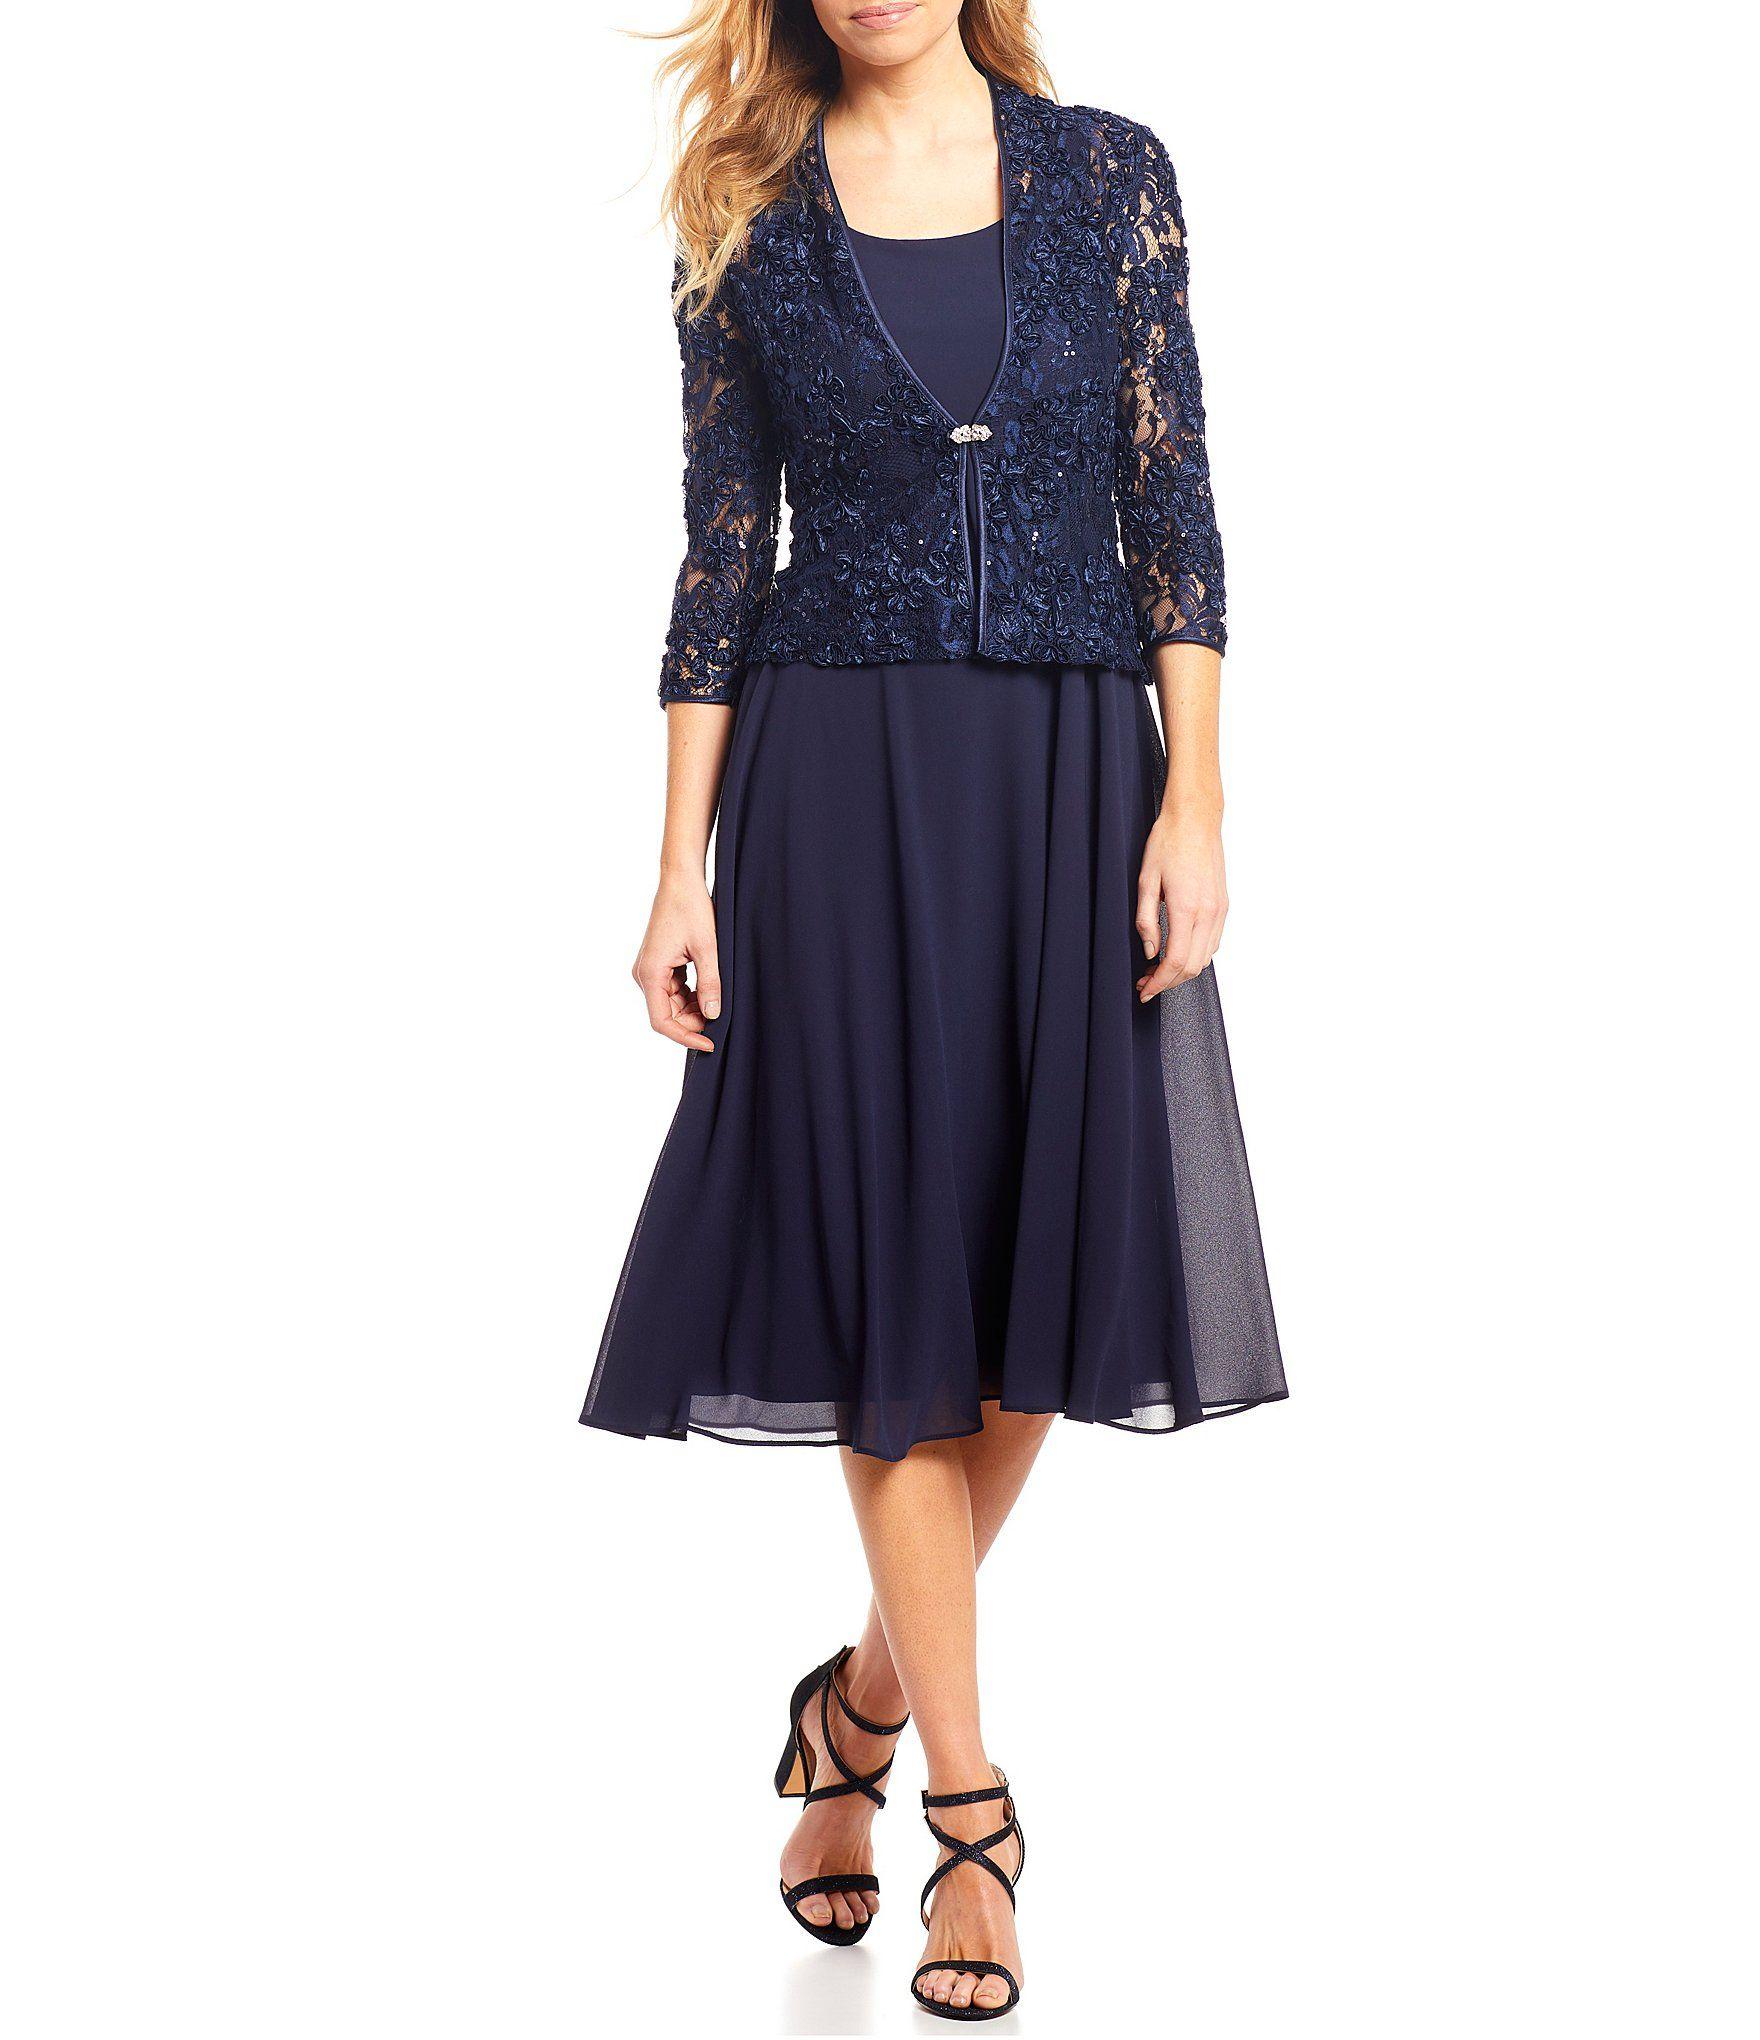 Jessica Howard Petite Size Soutache Lace 2 Piece Midi Length Jacket Dress Dillard S In 2021 Chiffon Midi Dress Jacket Dress Tea Length Bridesmaid Dresses [ 2040 x 1760 Pixel ]